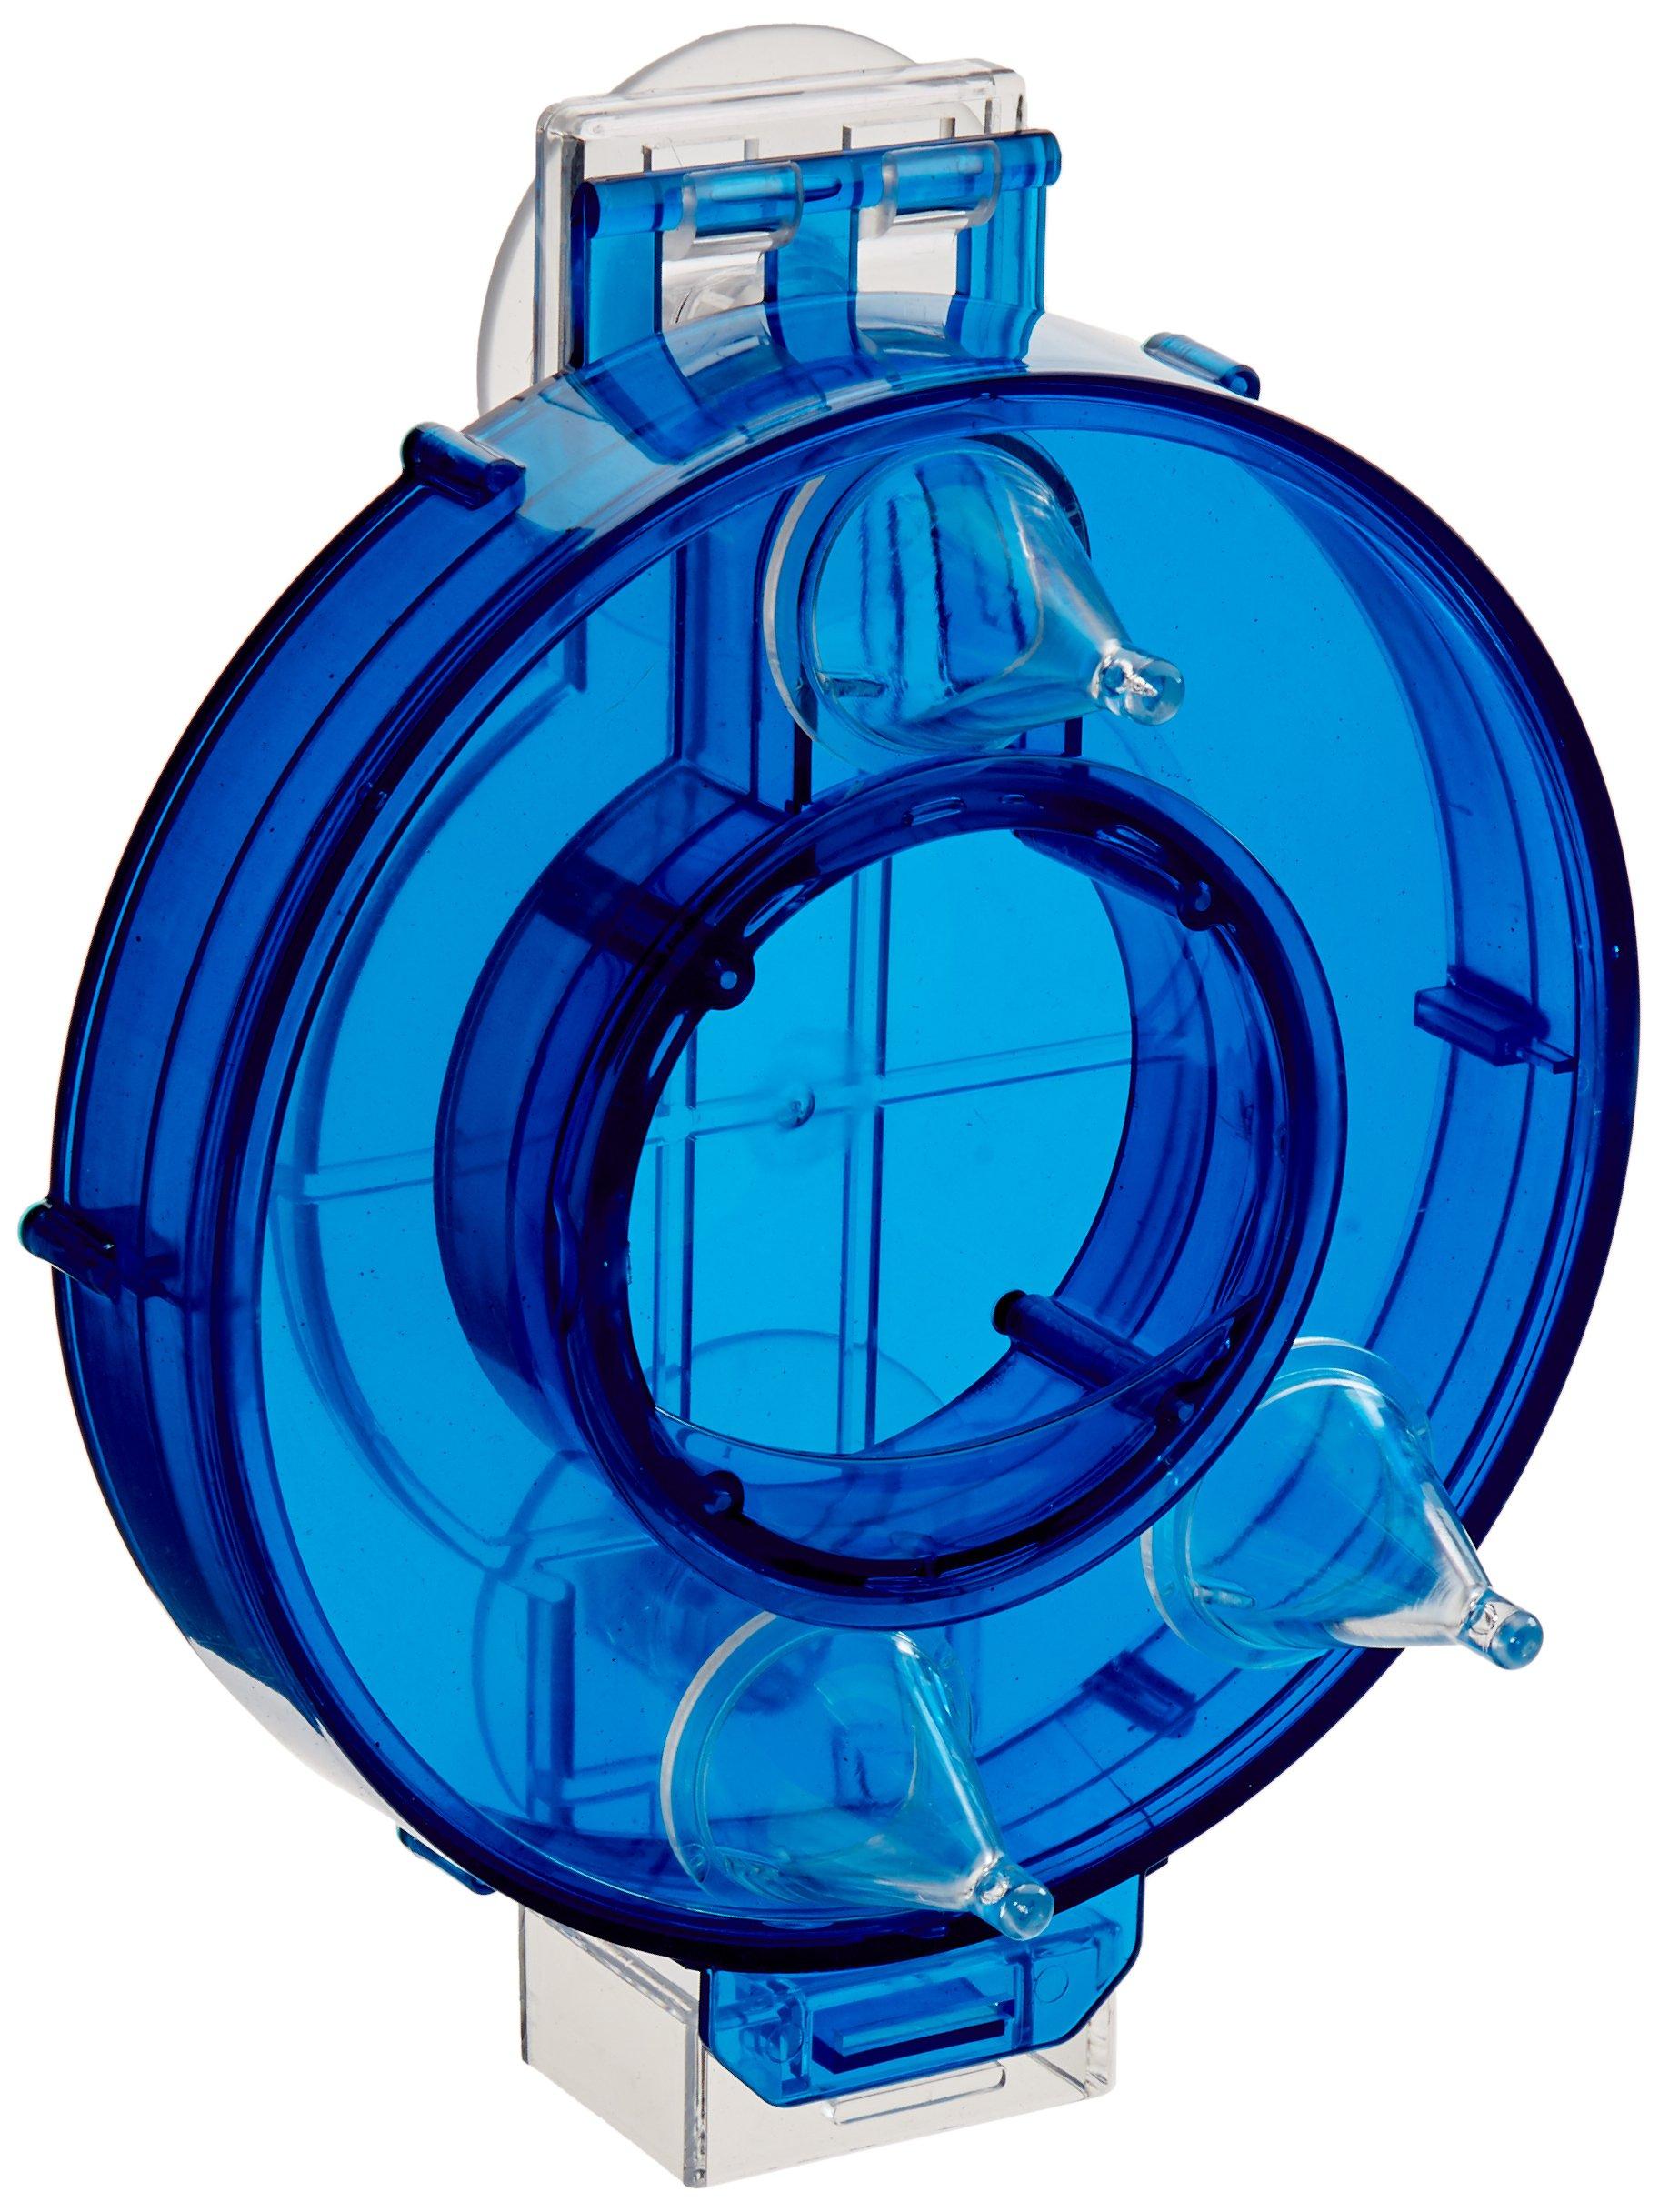 Creative Foraging Systems+E487 Mastermind Circle Pet Feeder, 8.5 by 10 by 3-Inch by Creative Foraging Systems+E487